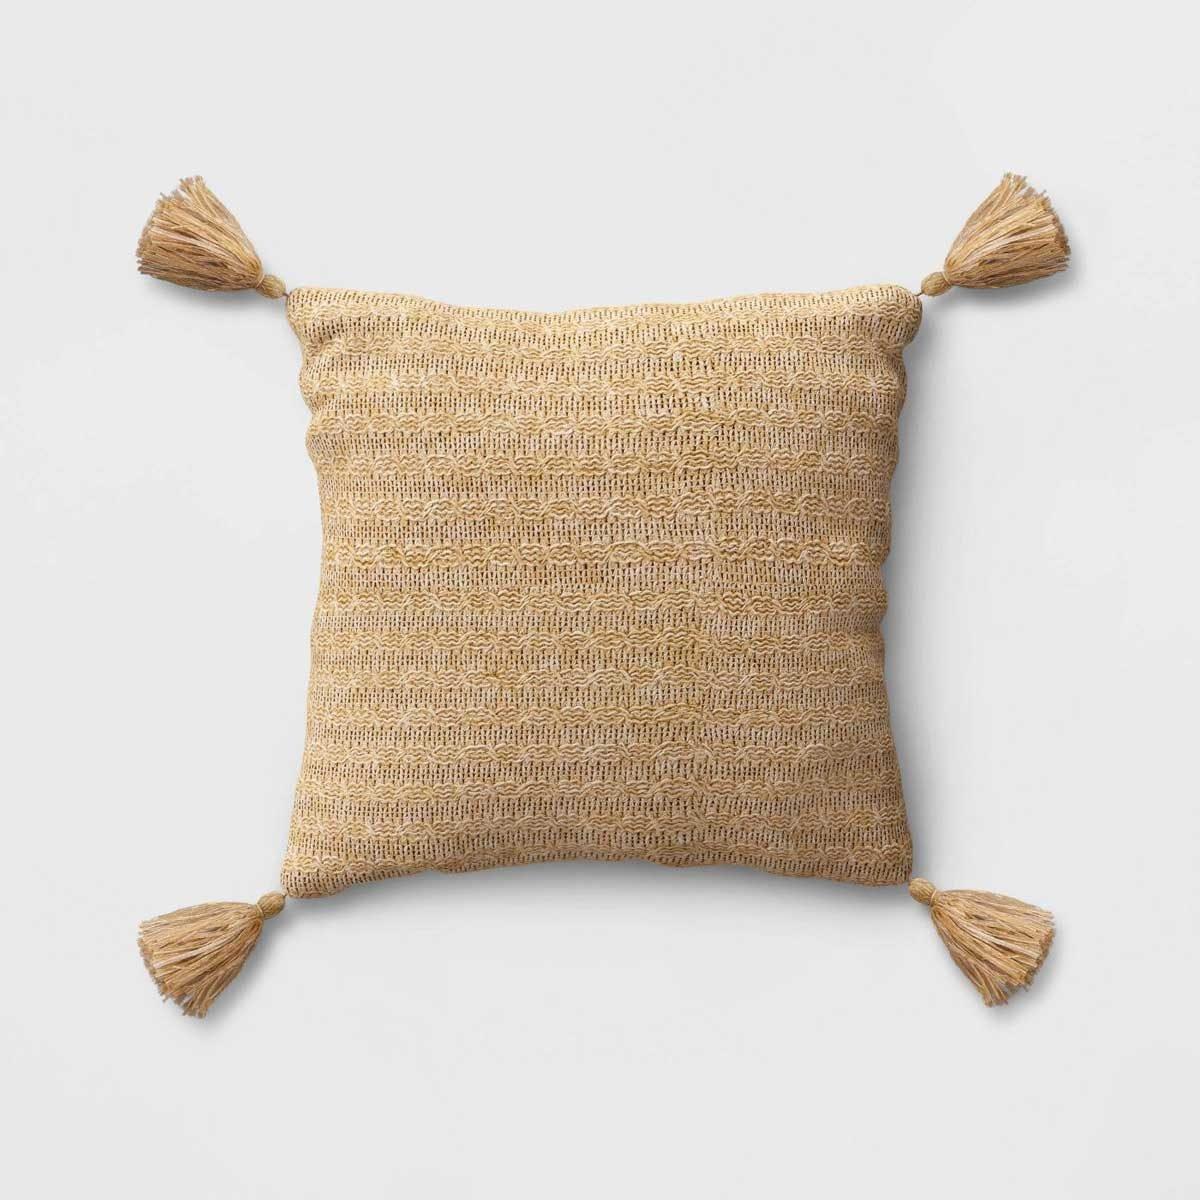 Neutral patio pillow